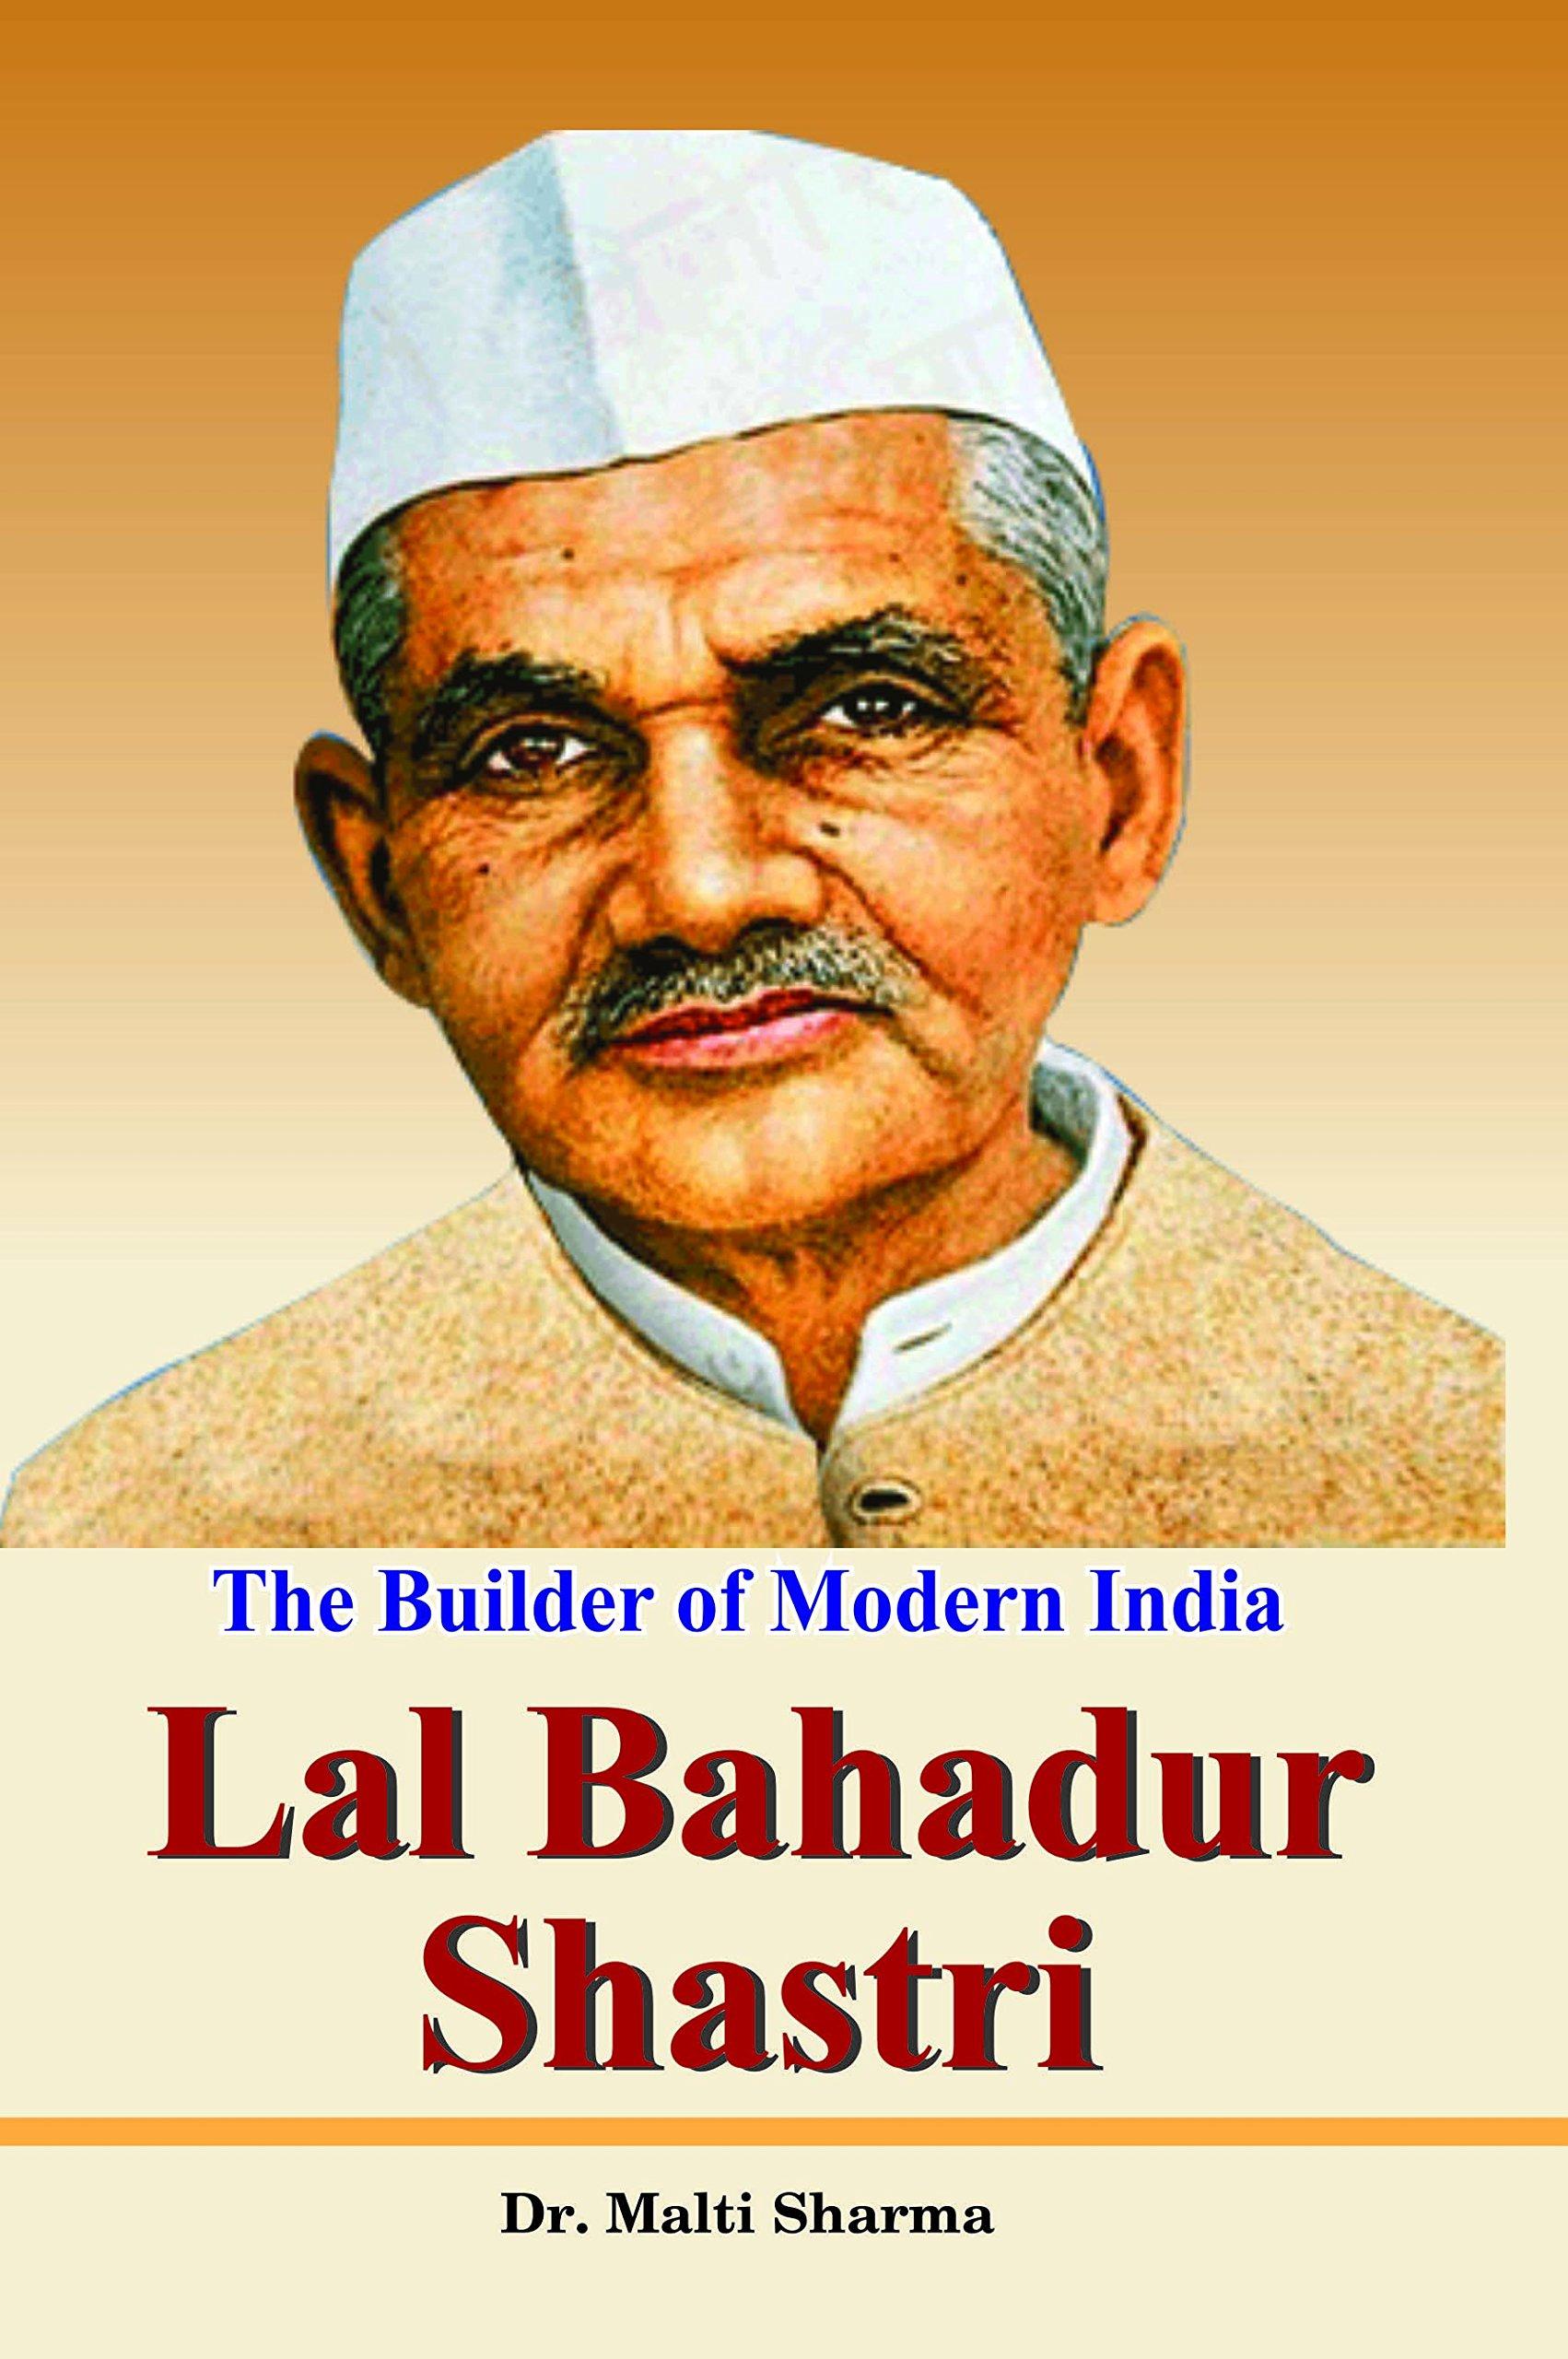 Lal Bahadur Shastri Biography,History - Prime Minister of India